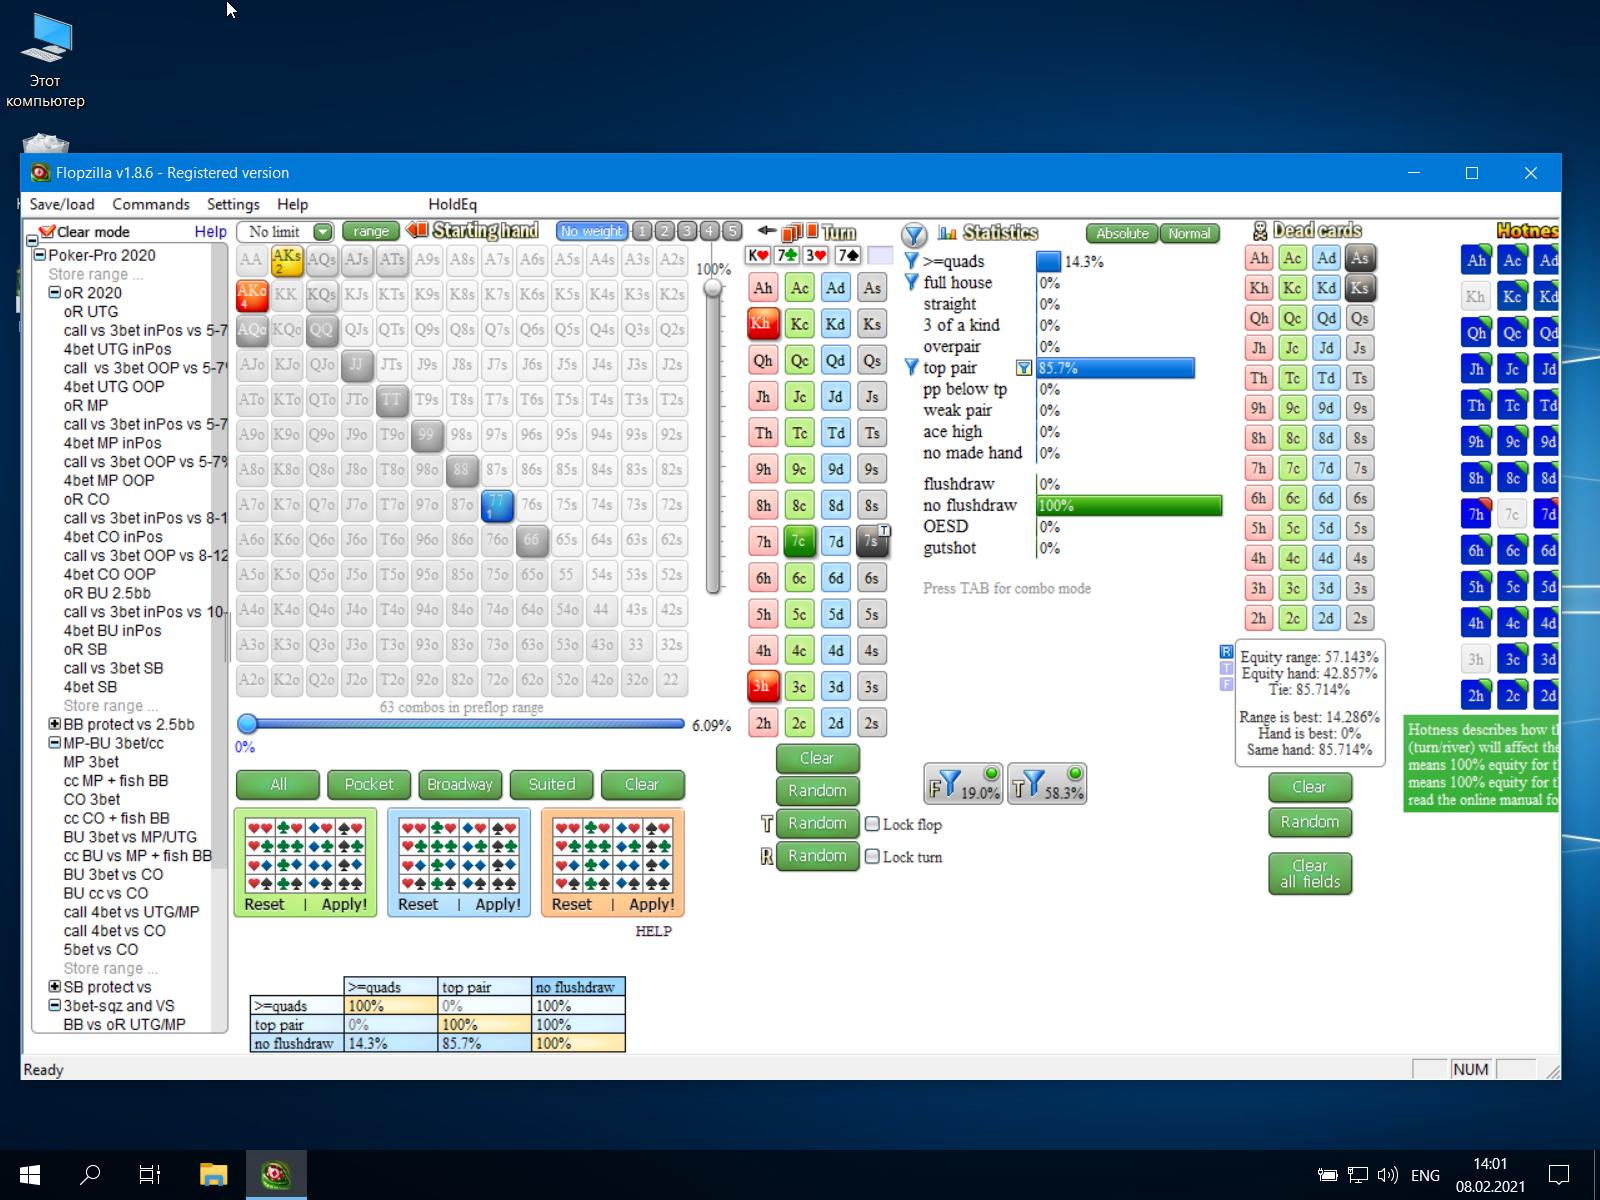 virtualboxwin-10080220211401571612782138.png